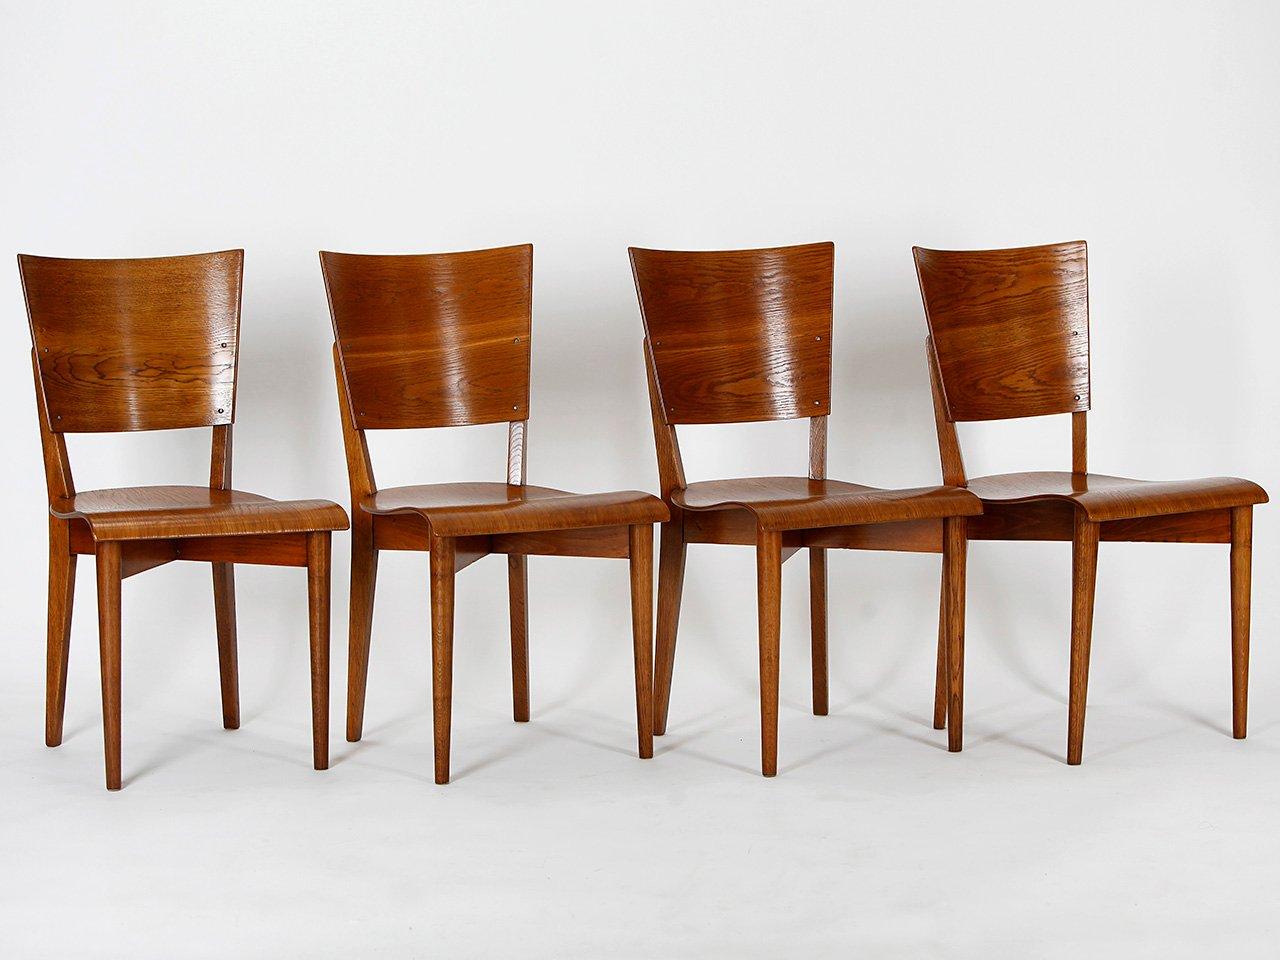 Chaises de salle manger model h 59 par jindrich halabala for Salle a manger 1930